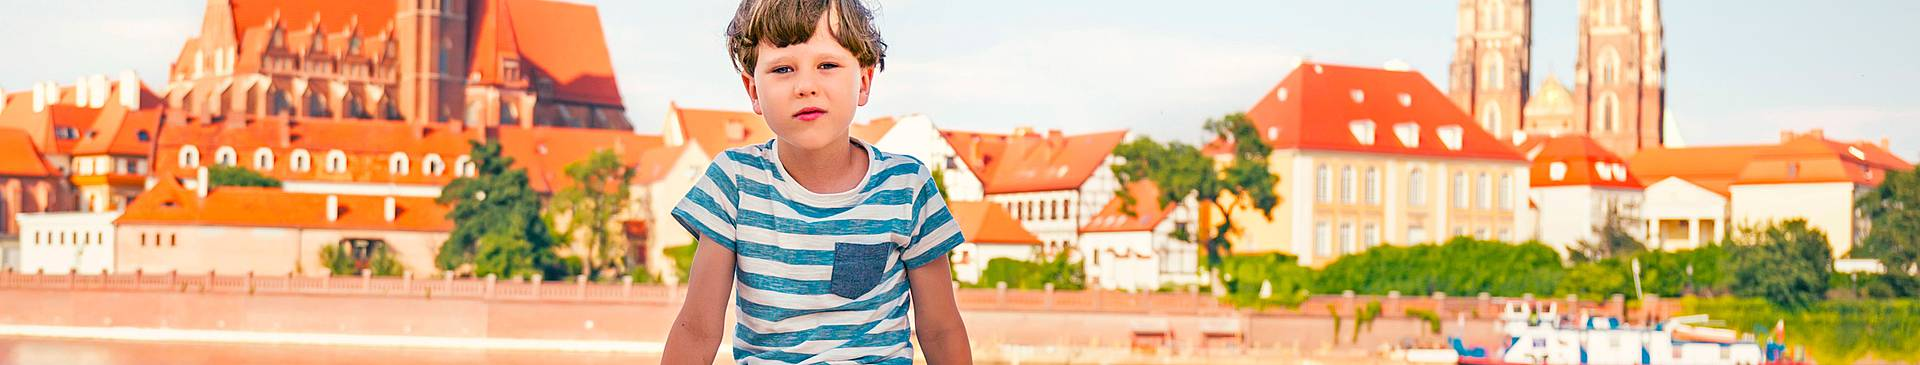 Polonia con niños